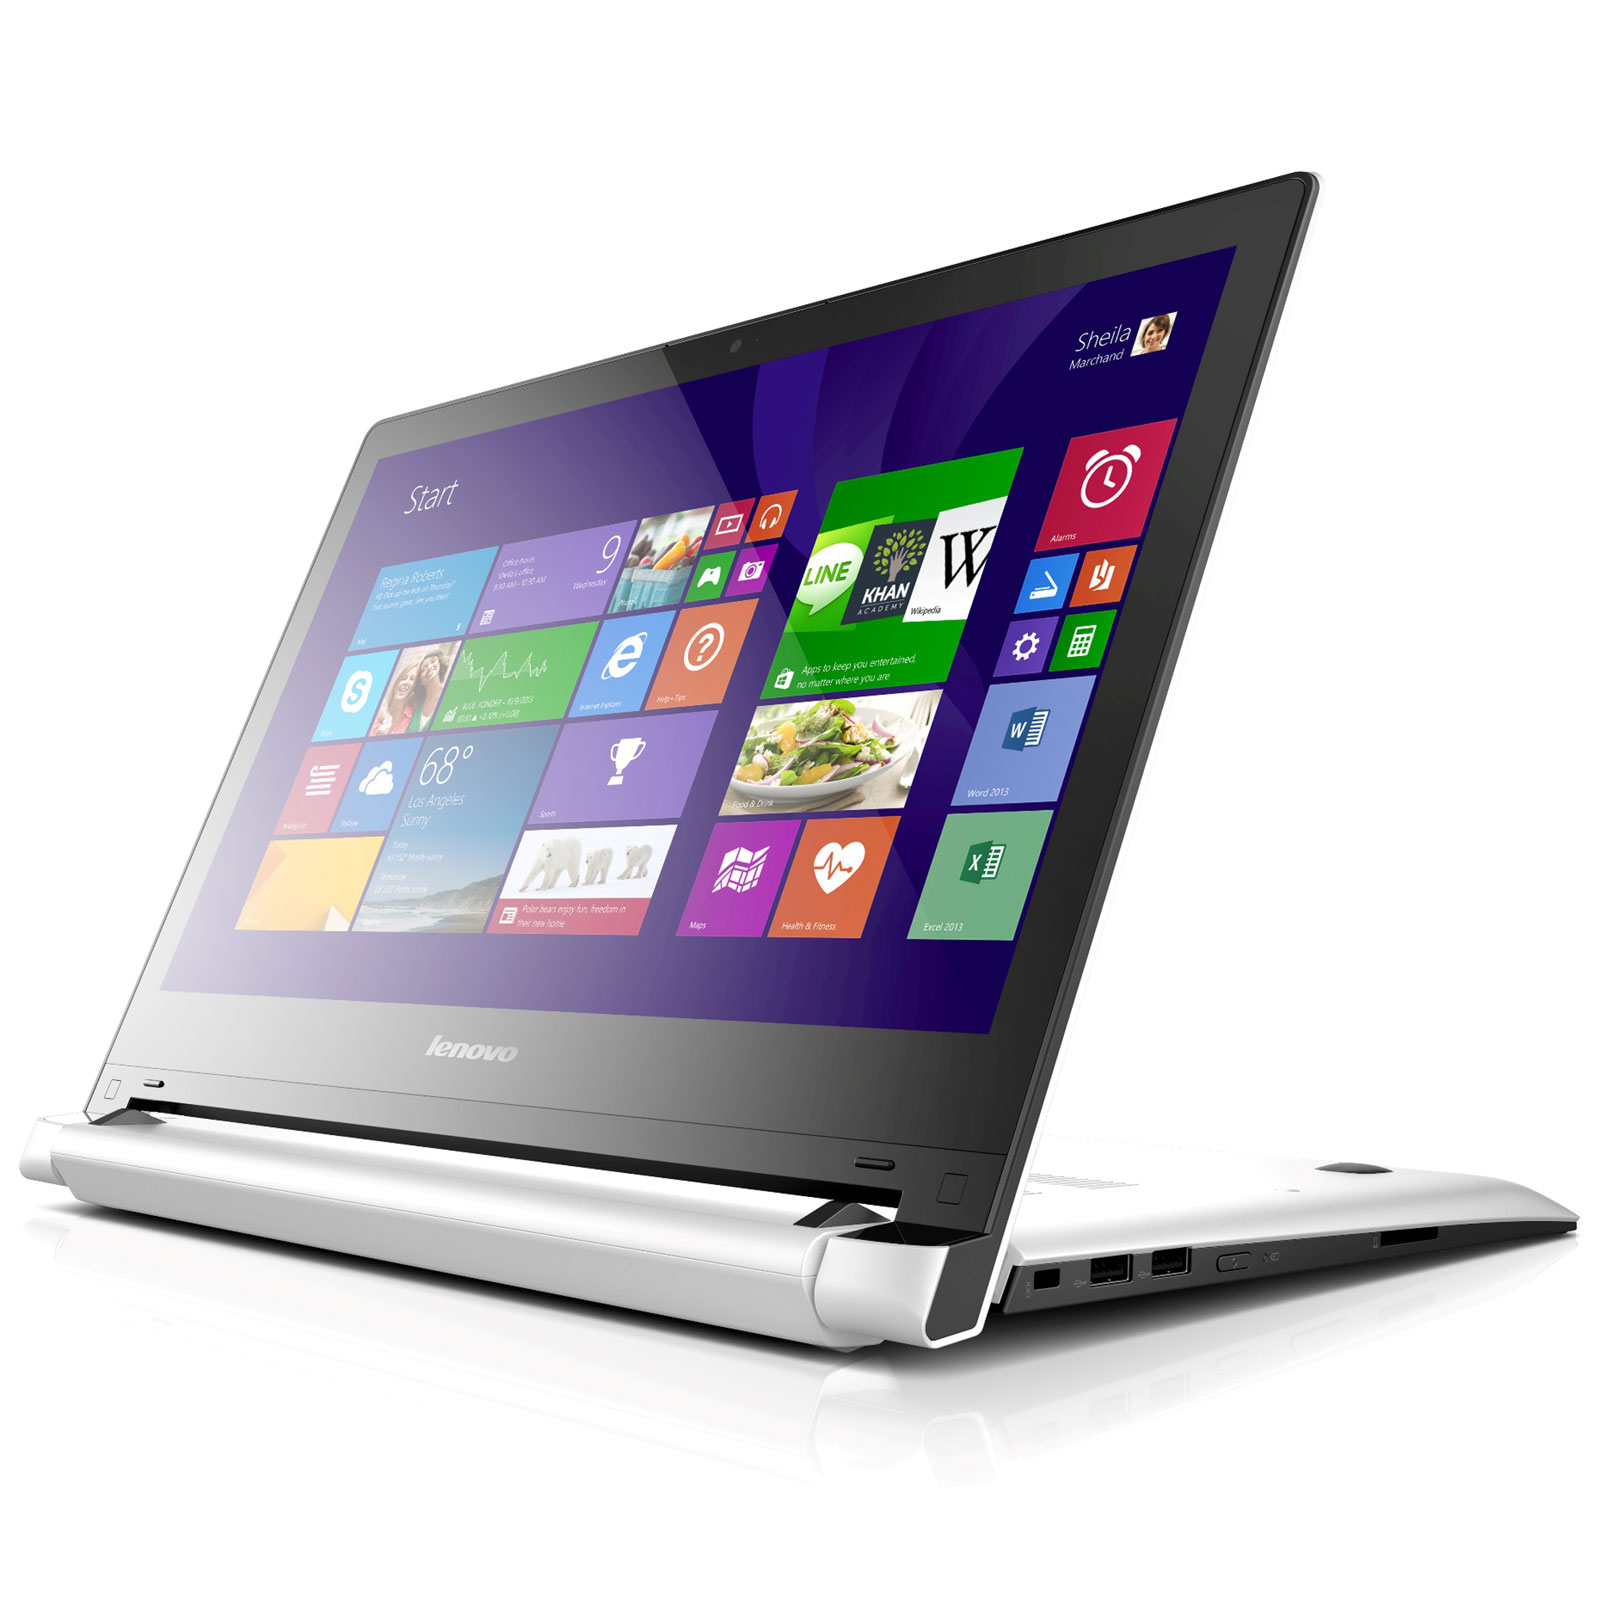 lenovo flex 2 blanc 59436085 pc portable lenovo sur ldlc. Black Bedroom Furniture Sets. Home Design Ideas